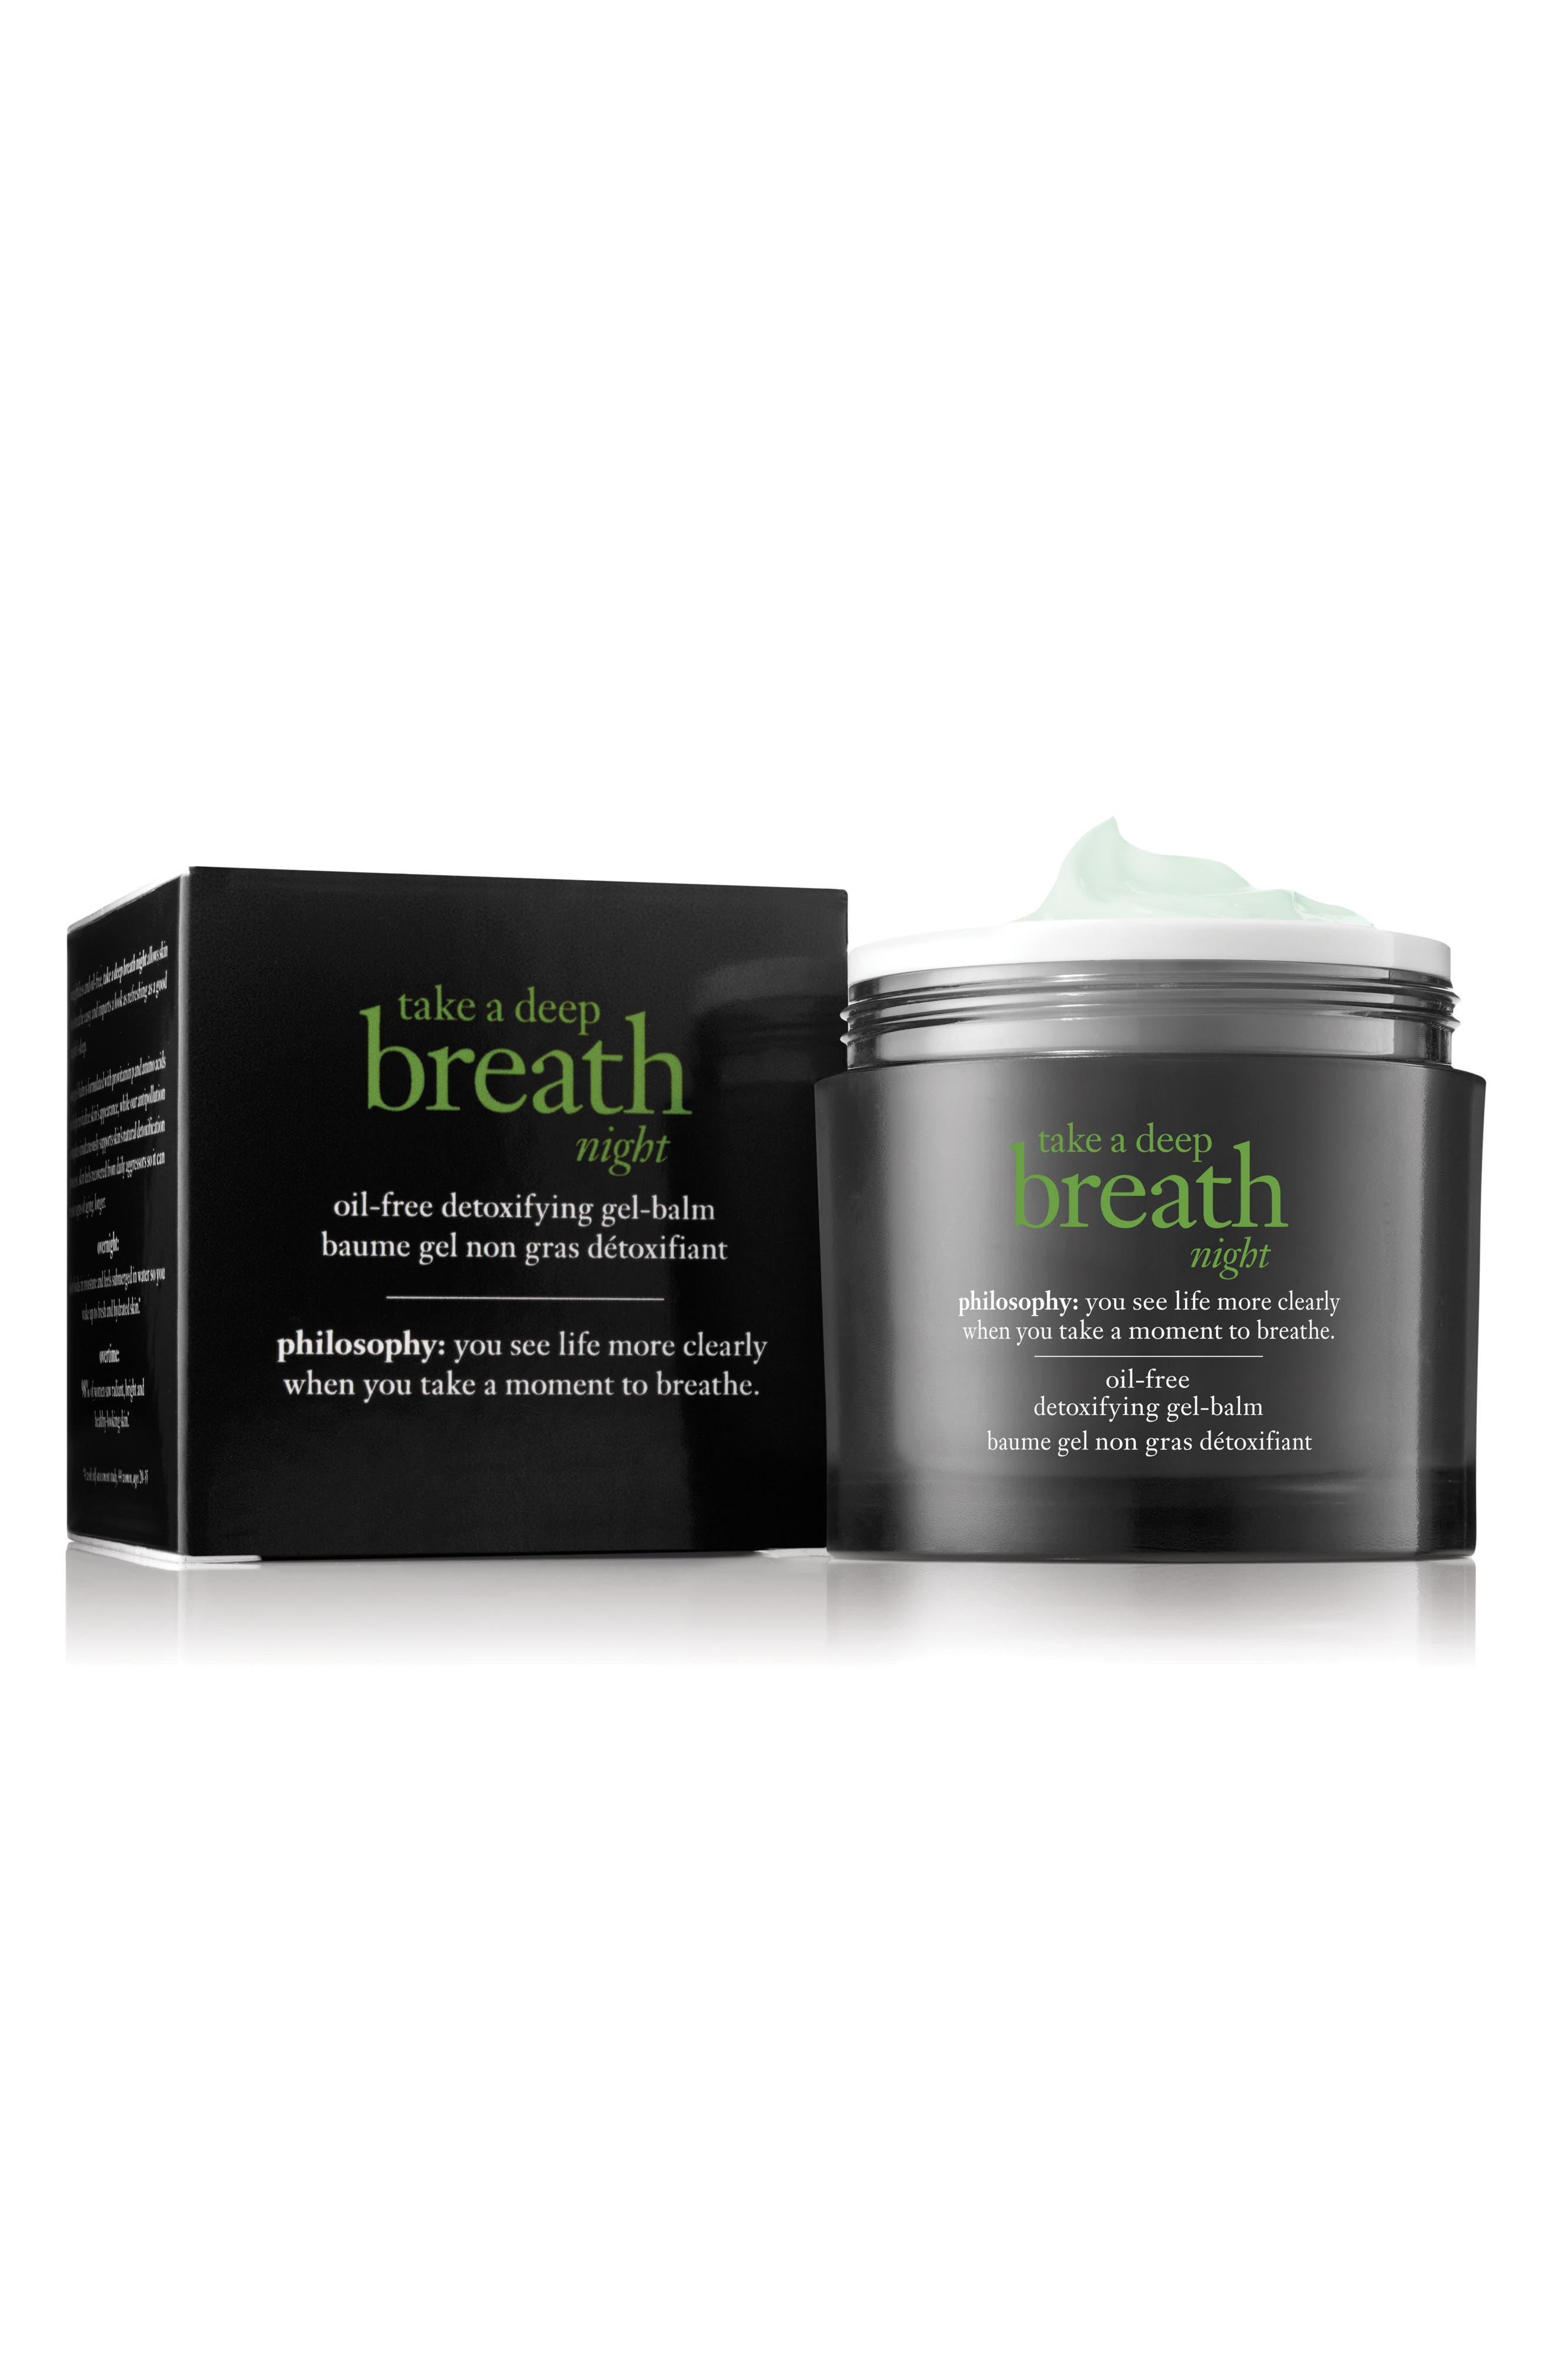 philosophy take a deep breath oil-free detoxifying night balm